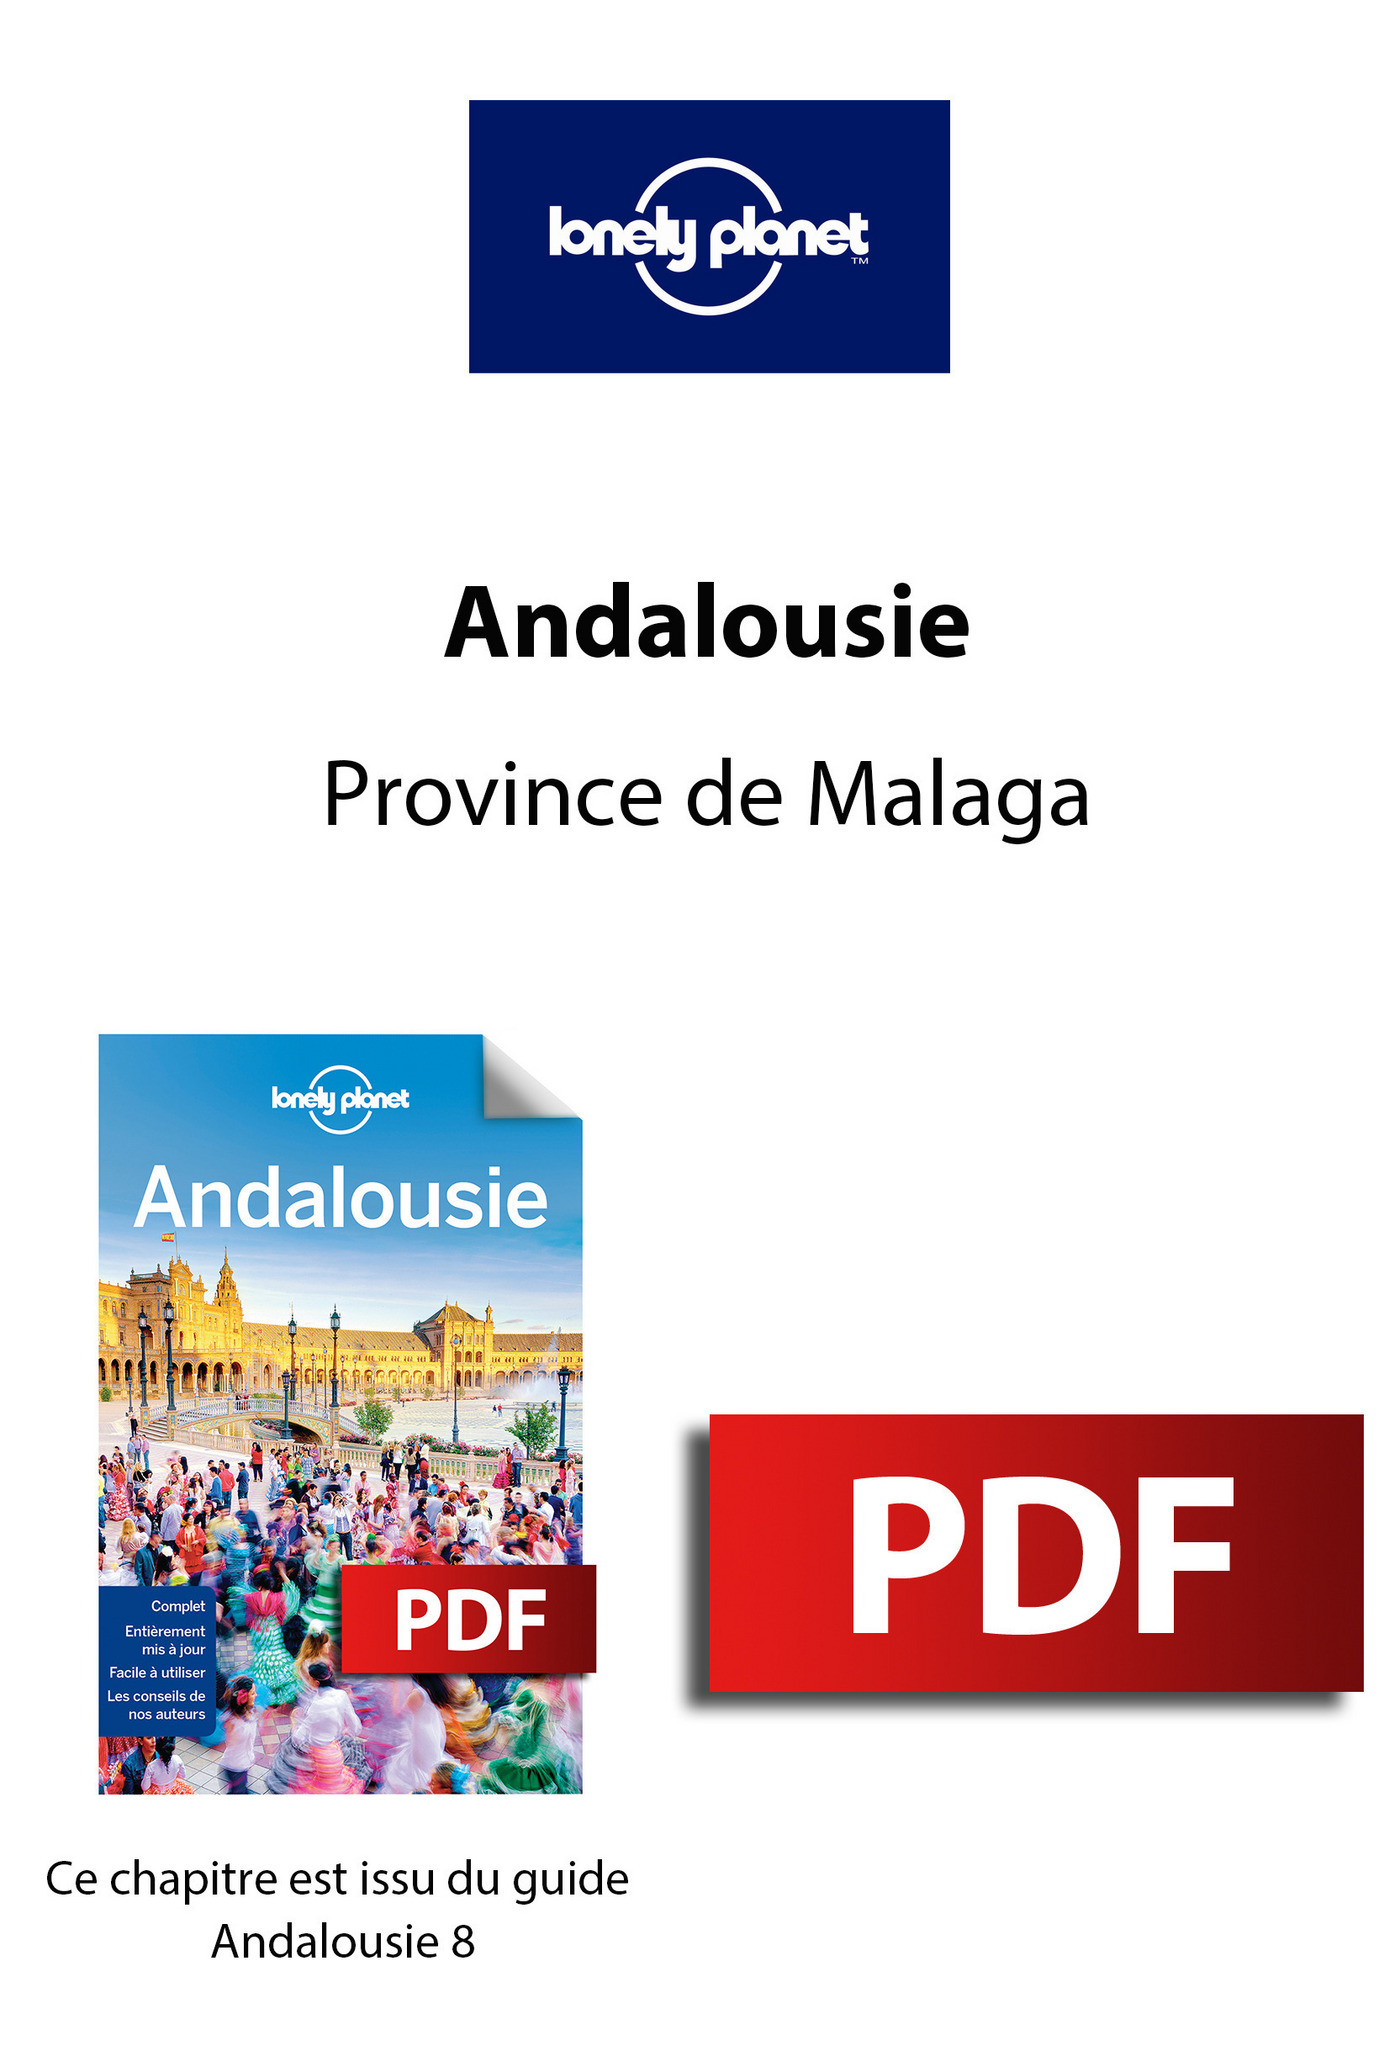 Andalousie - Province de Malaga